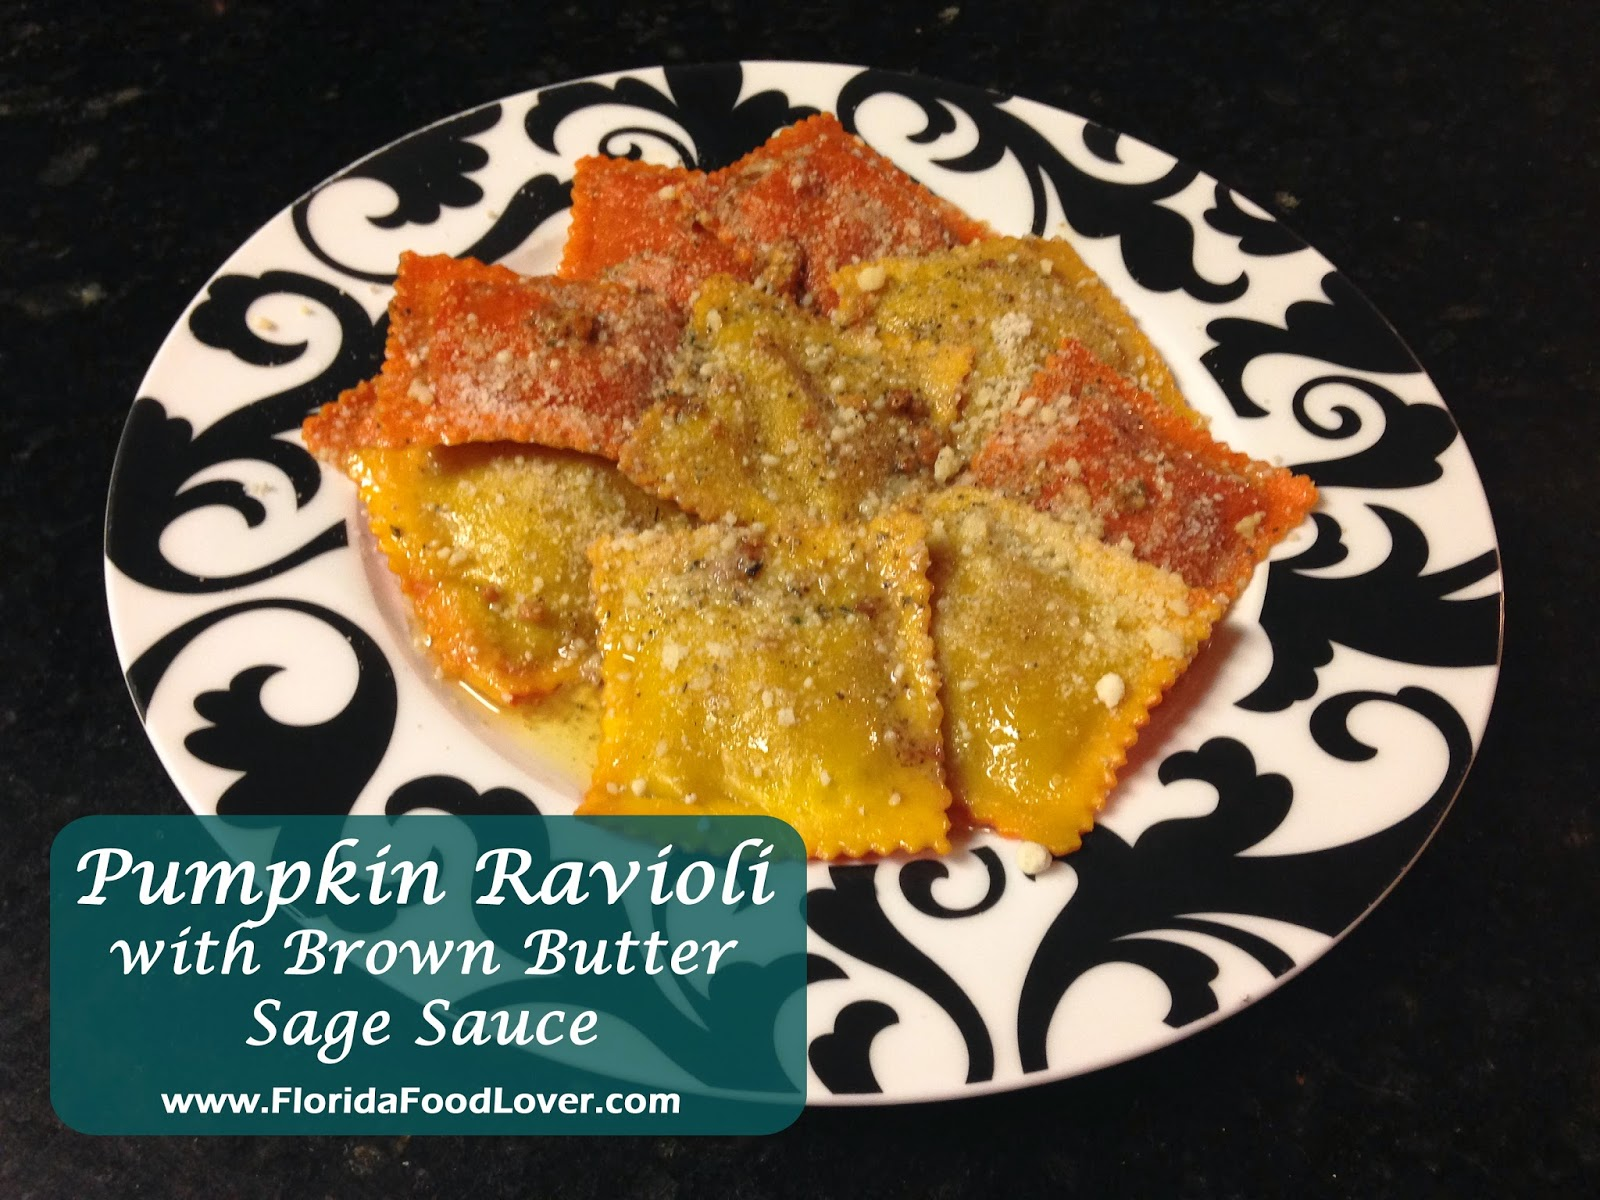 Pumpkin Ravioli with Brown Butter Sage Sauce | Florida Food Lover